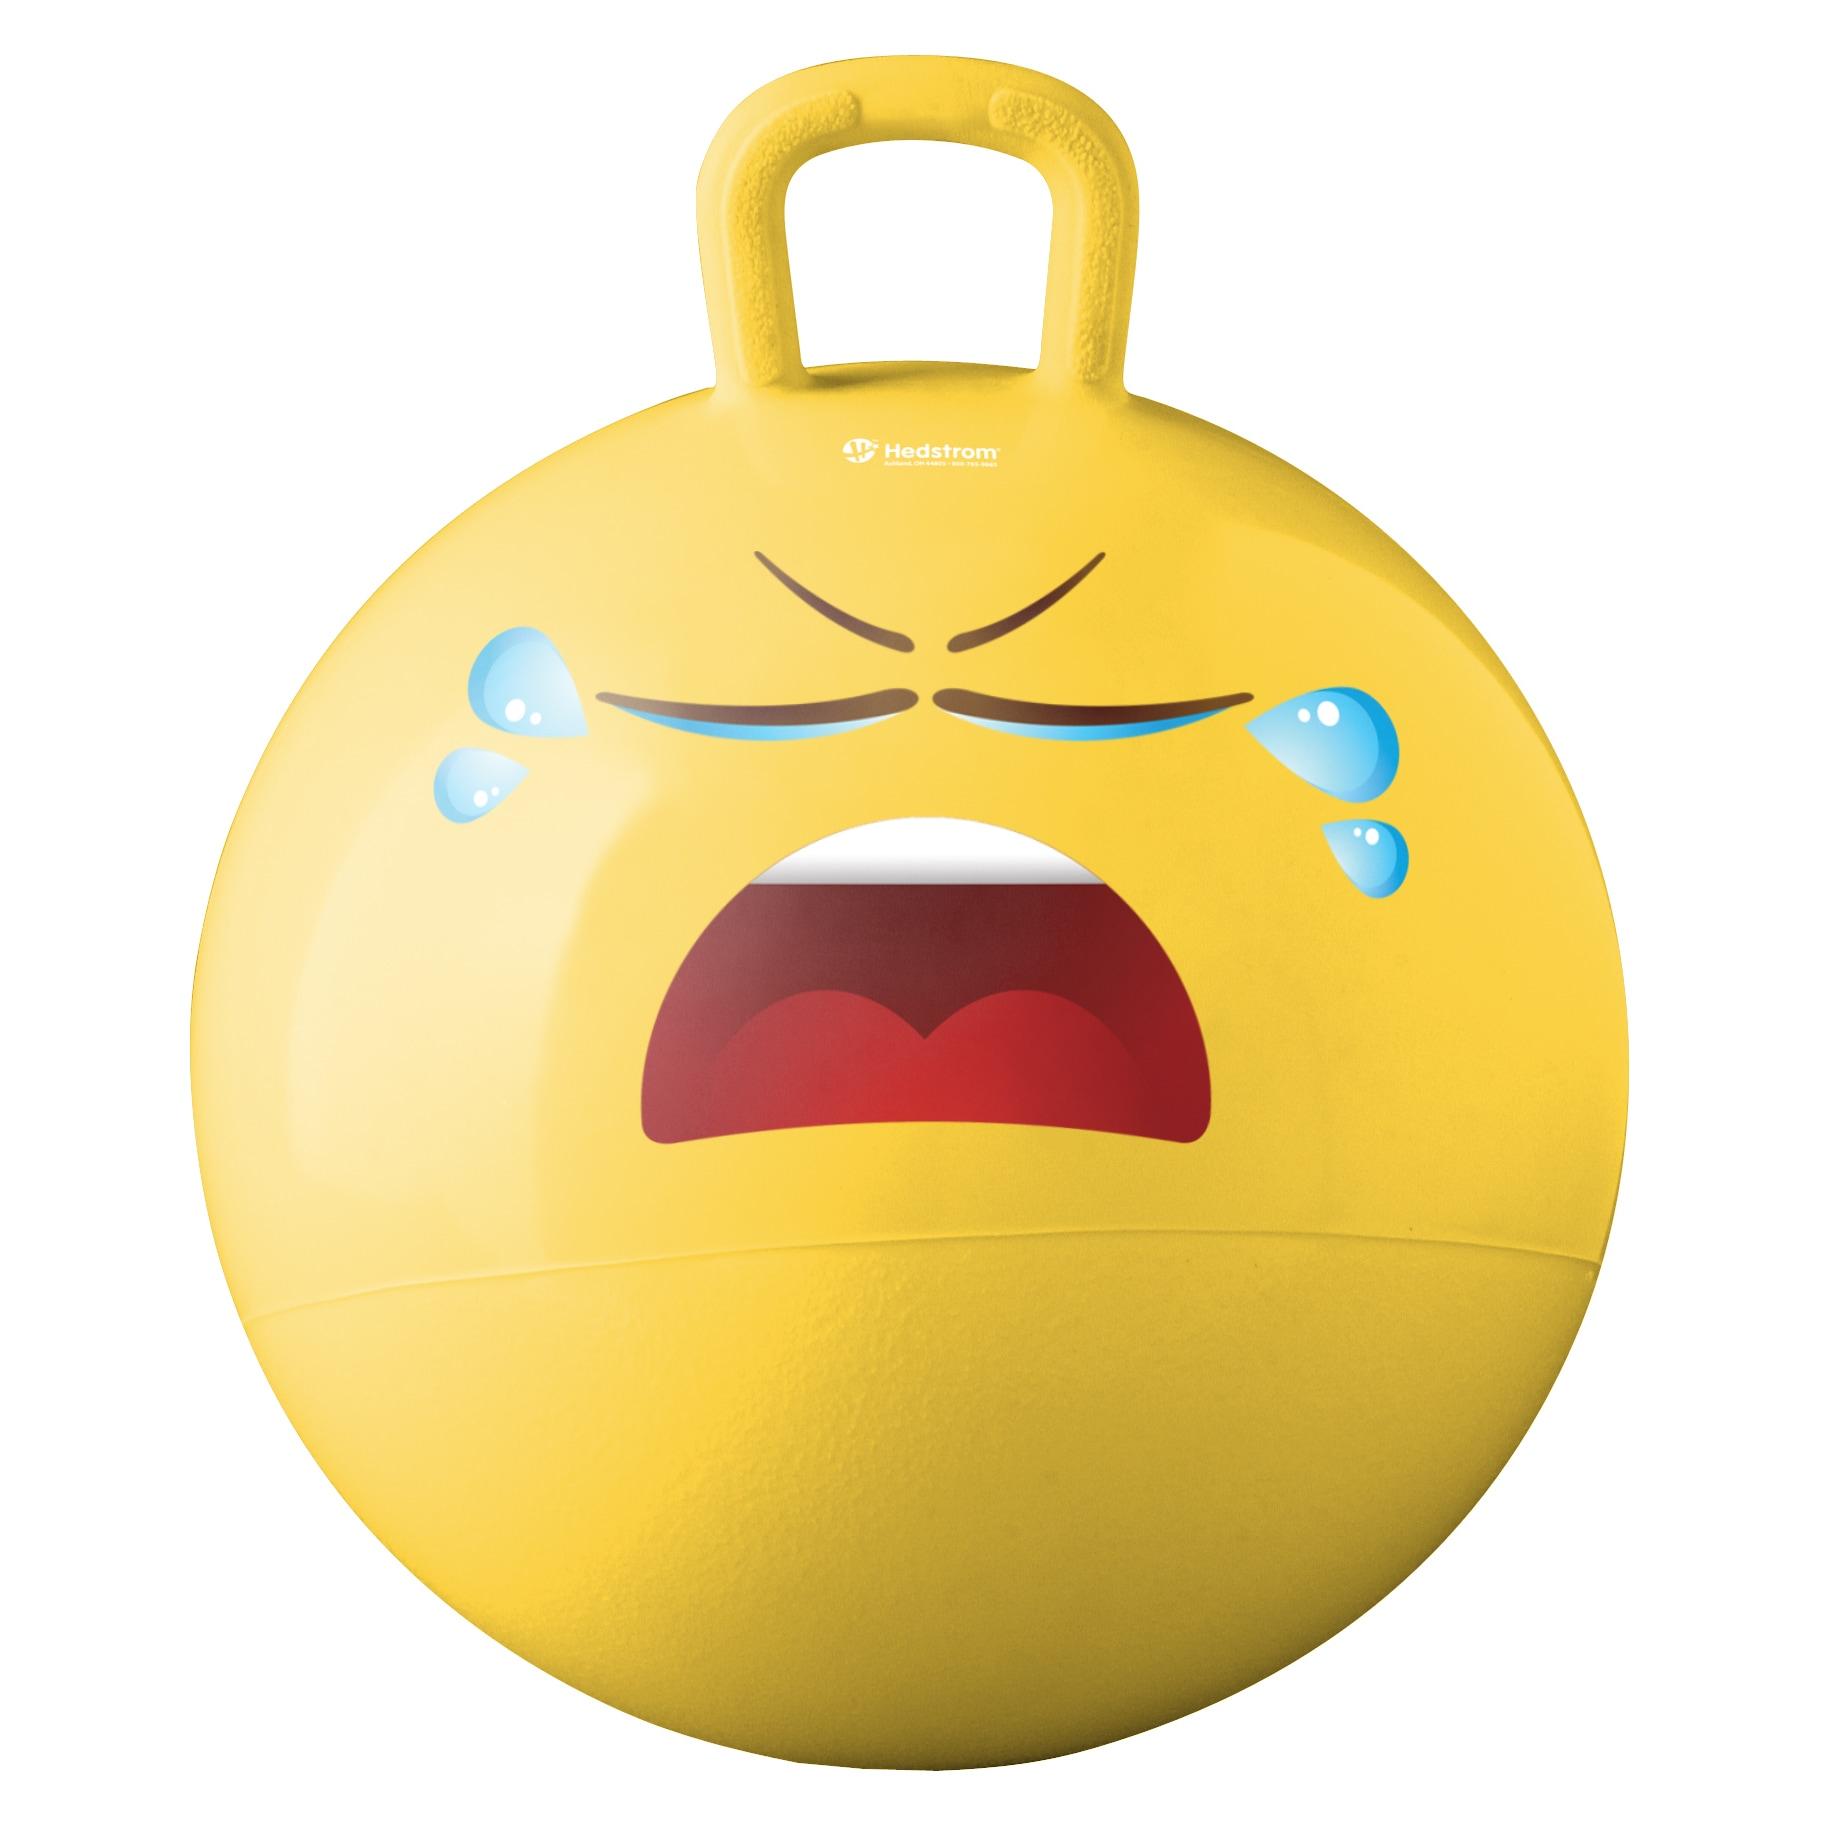 "Hedstrom Emoti Hopper Crying (15"" Emoti Hopper), Yellow"